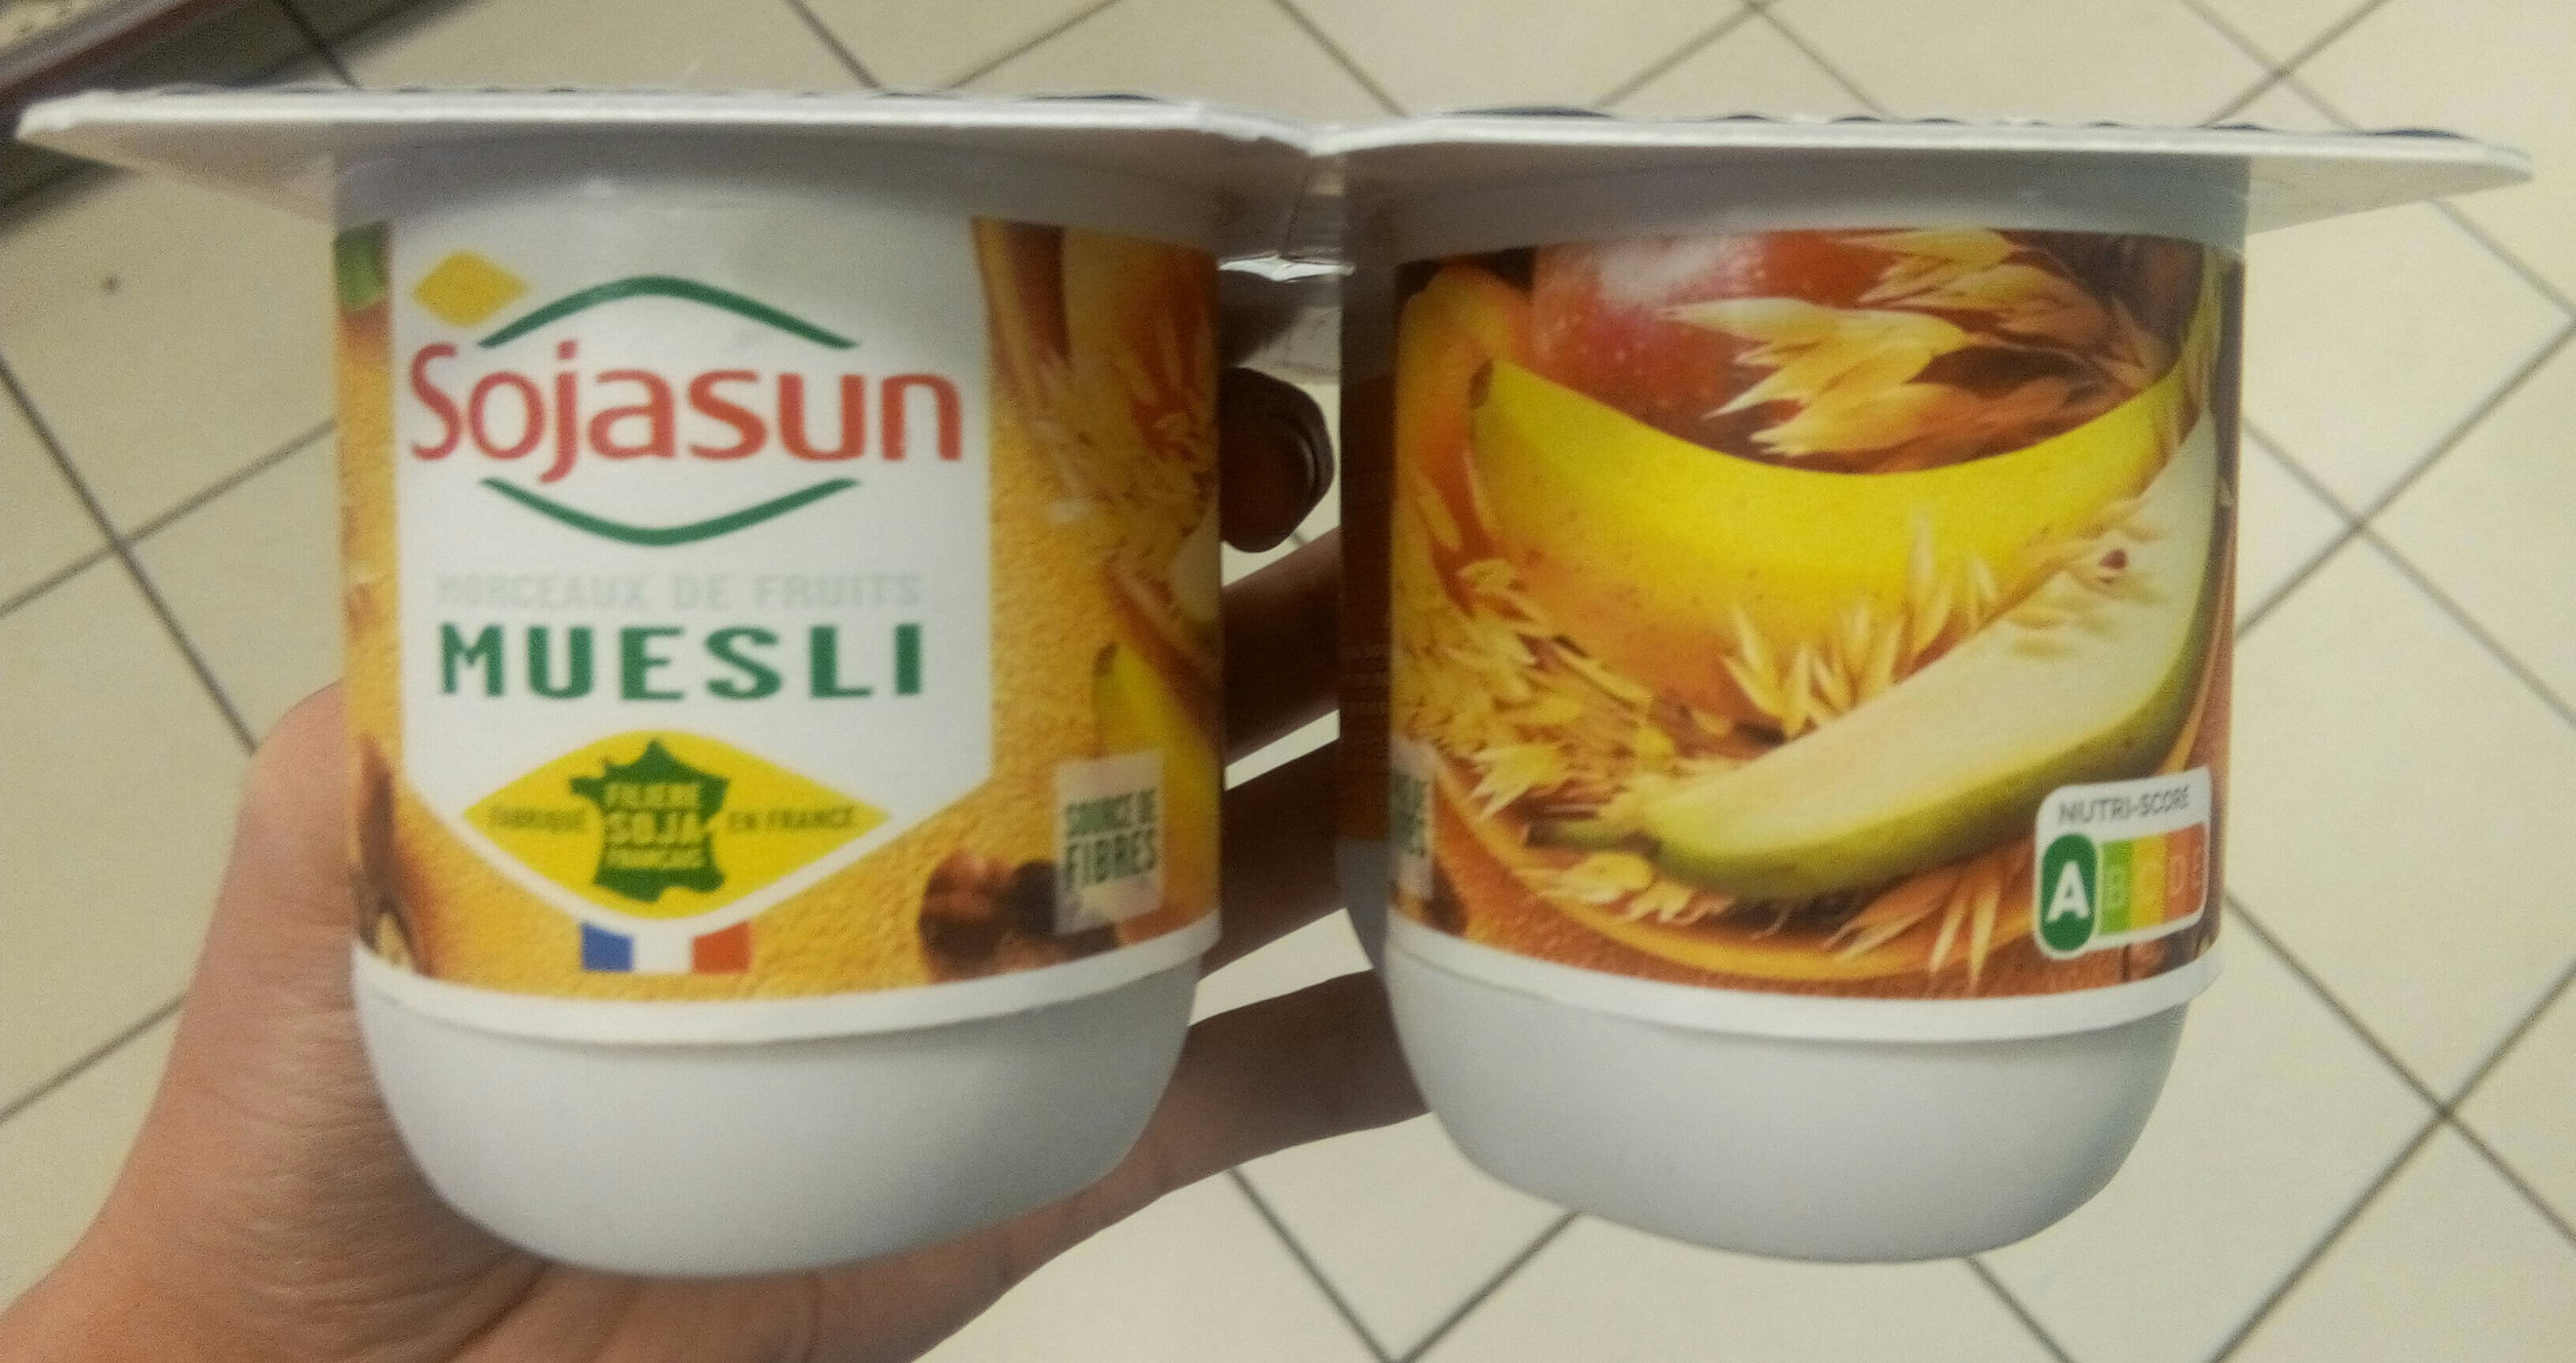 Dessert végétal, Muesli & Fruits - Product